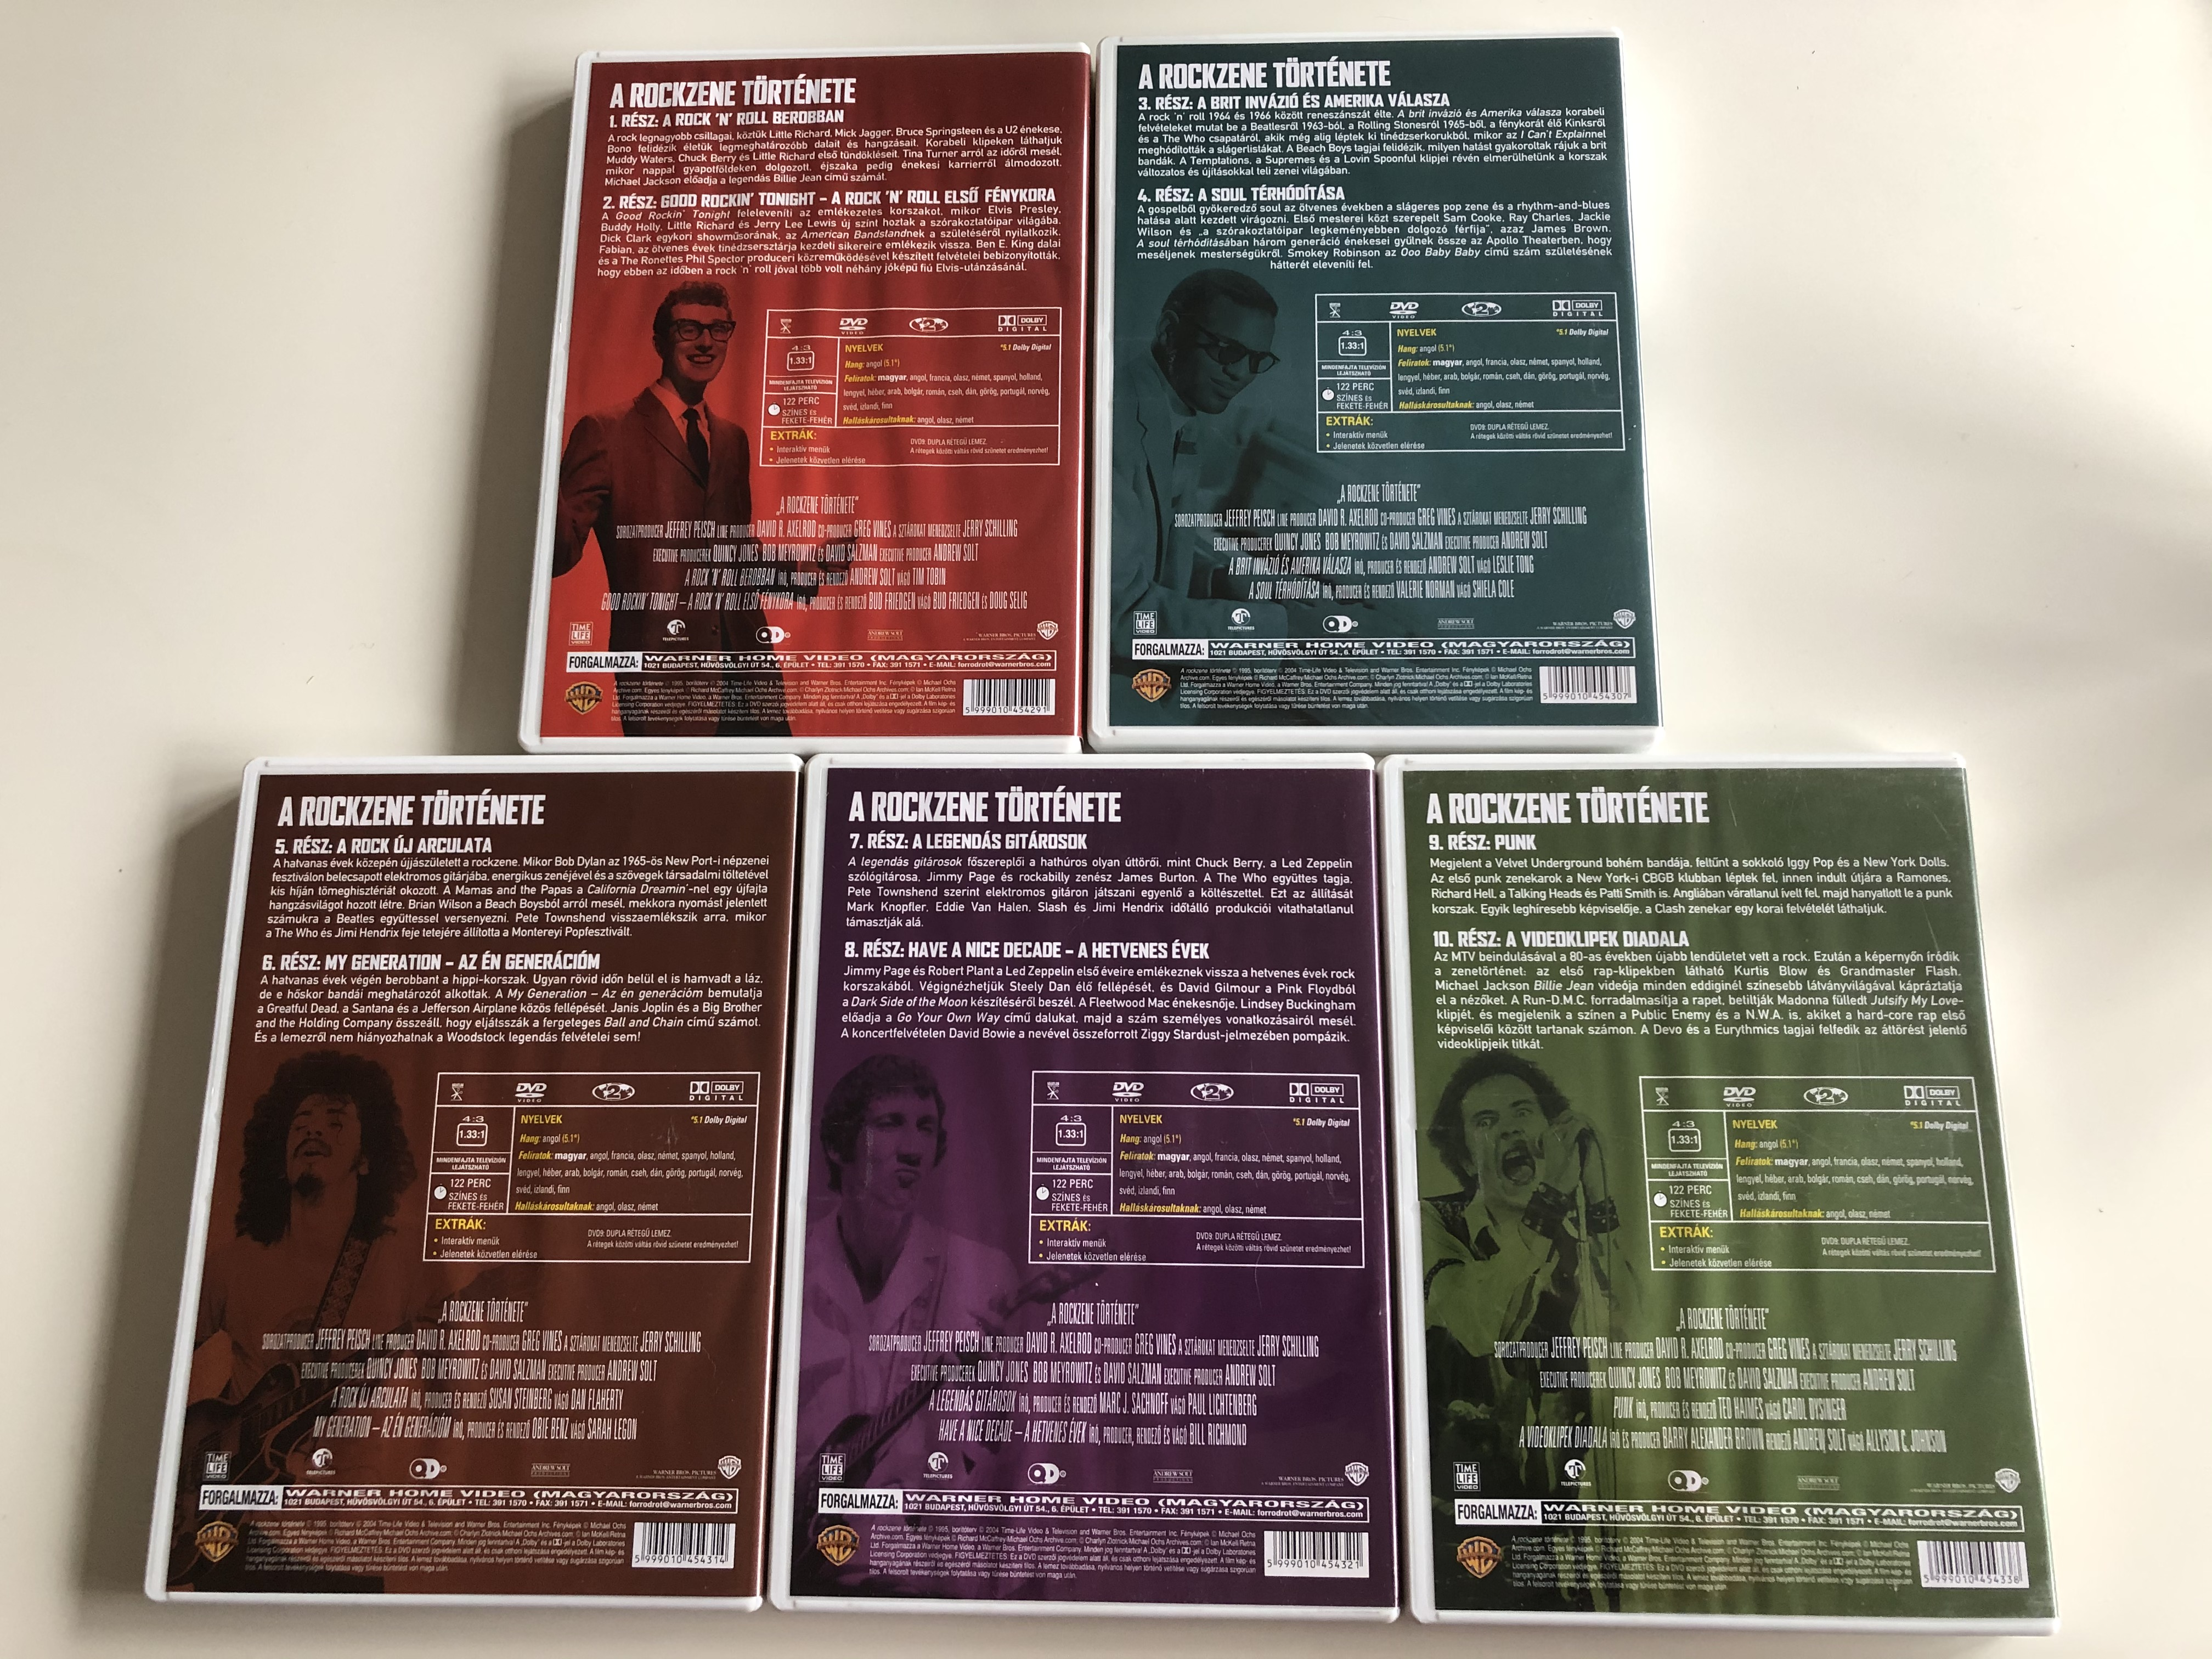 the-history-of-rock-n-roll-dvd-set-5-x-dvd-1995-4.jpg